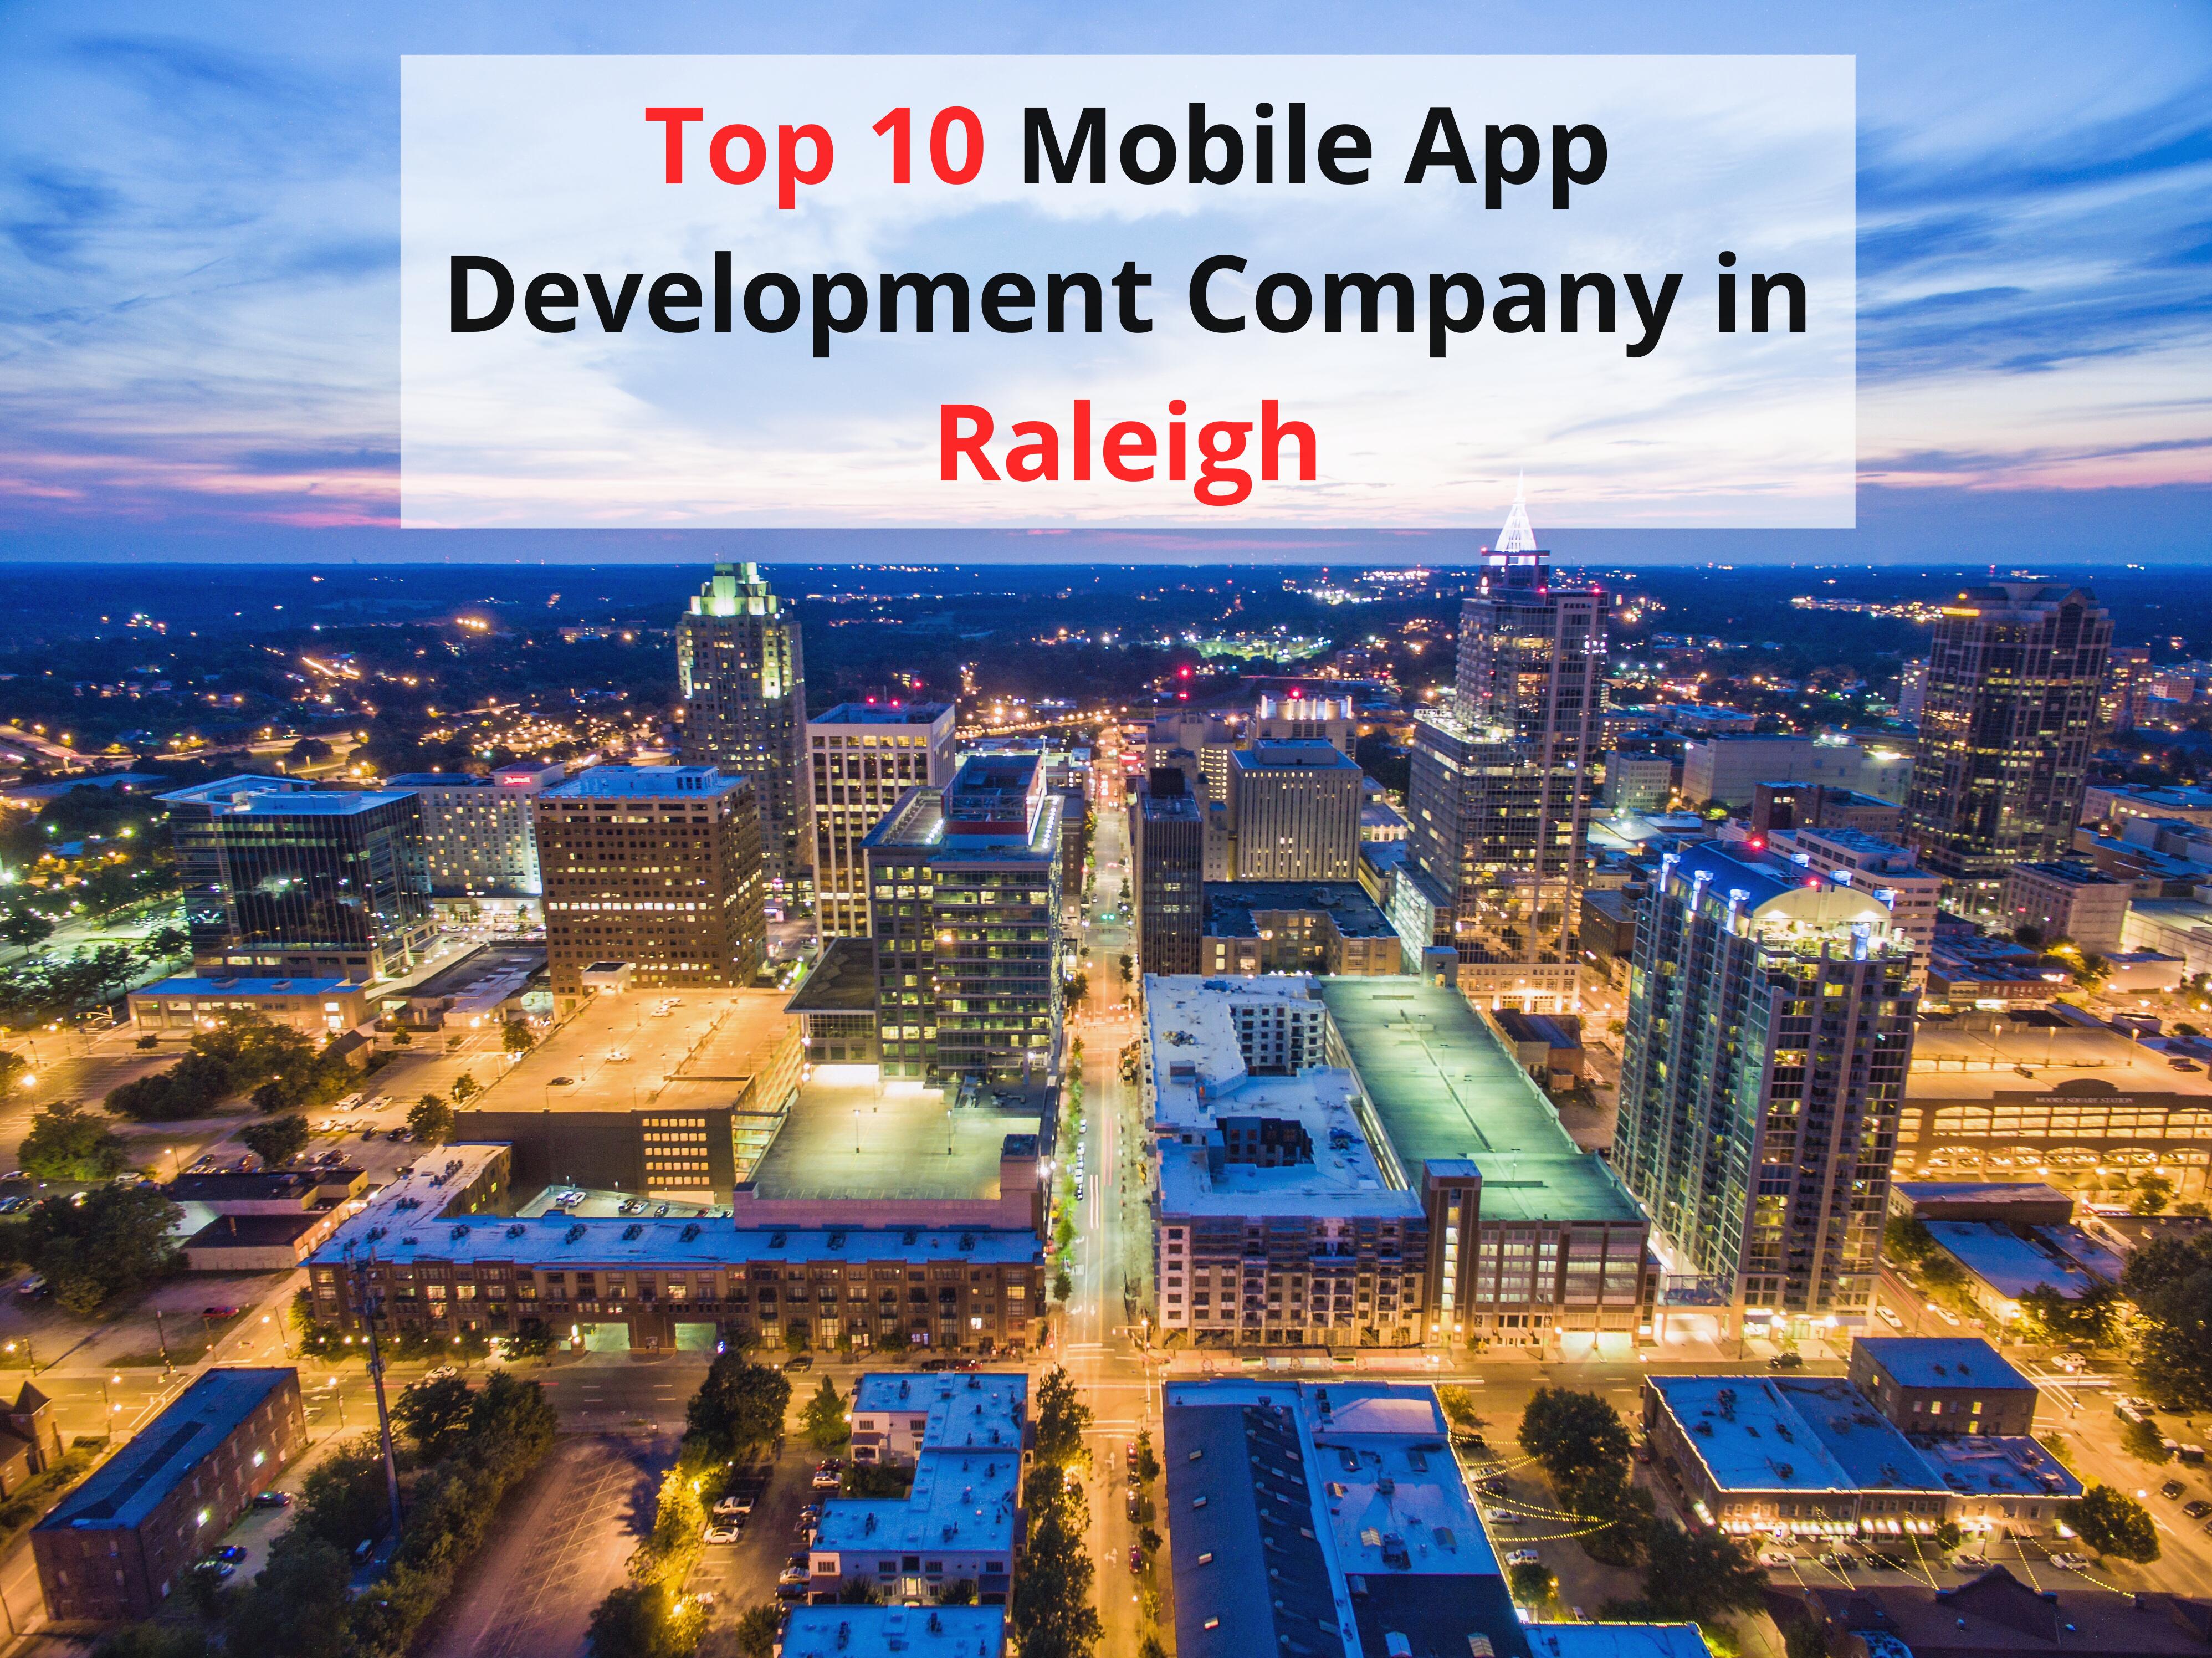 Top 10 Mobile App Development Company in Raleigh - WebClues Infotech